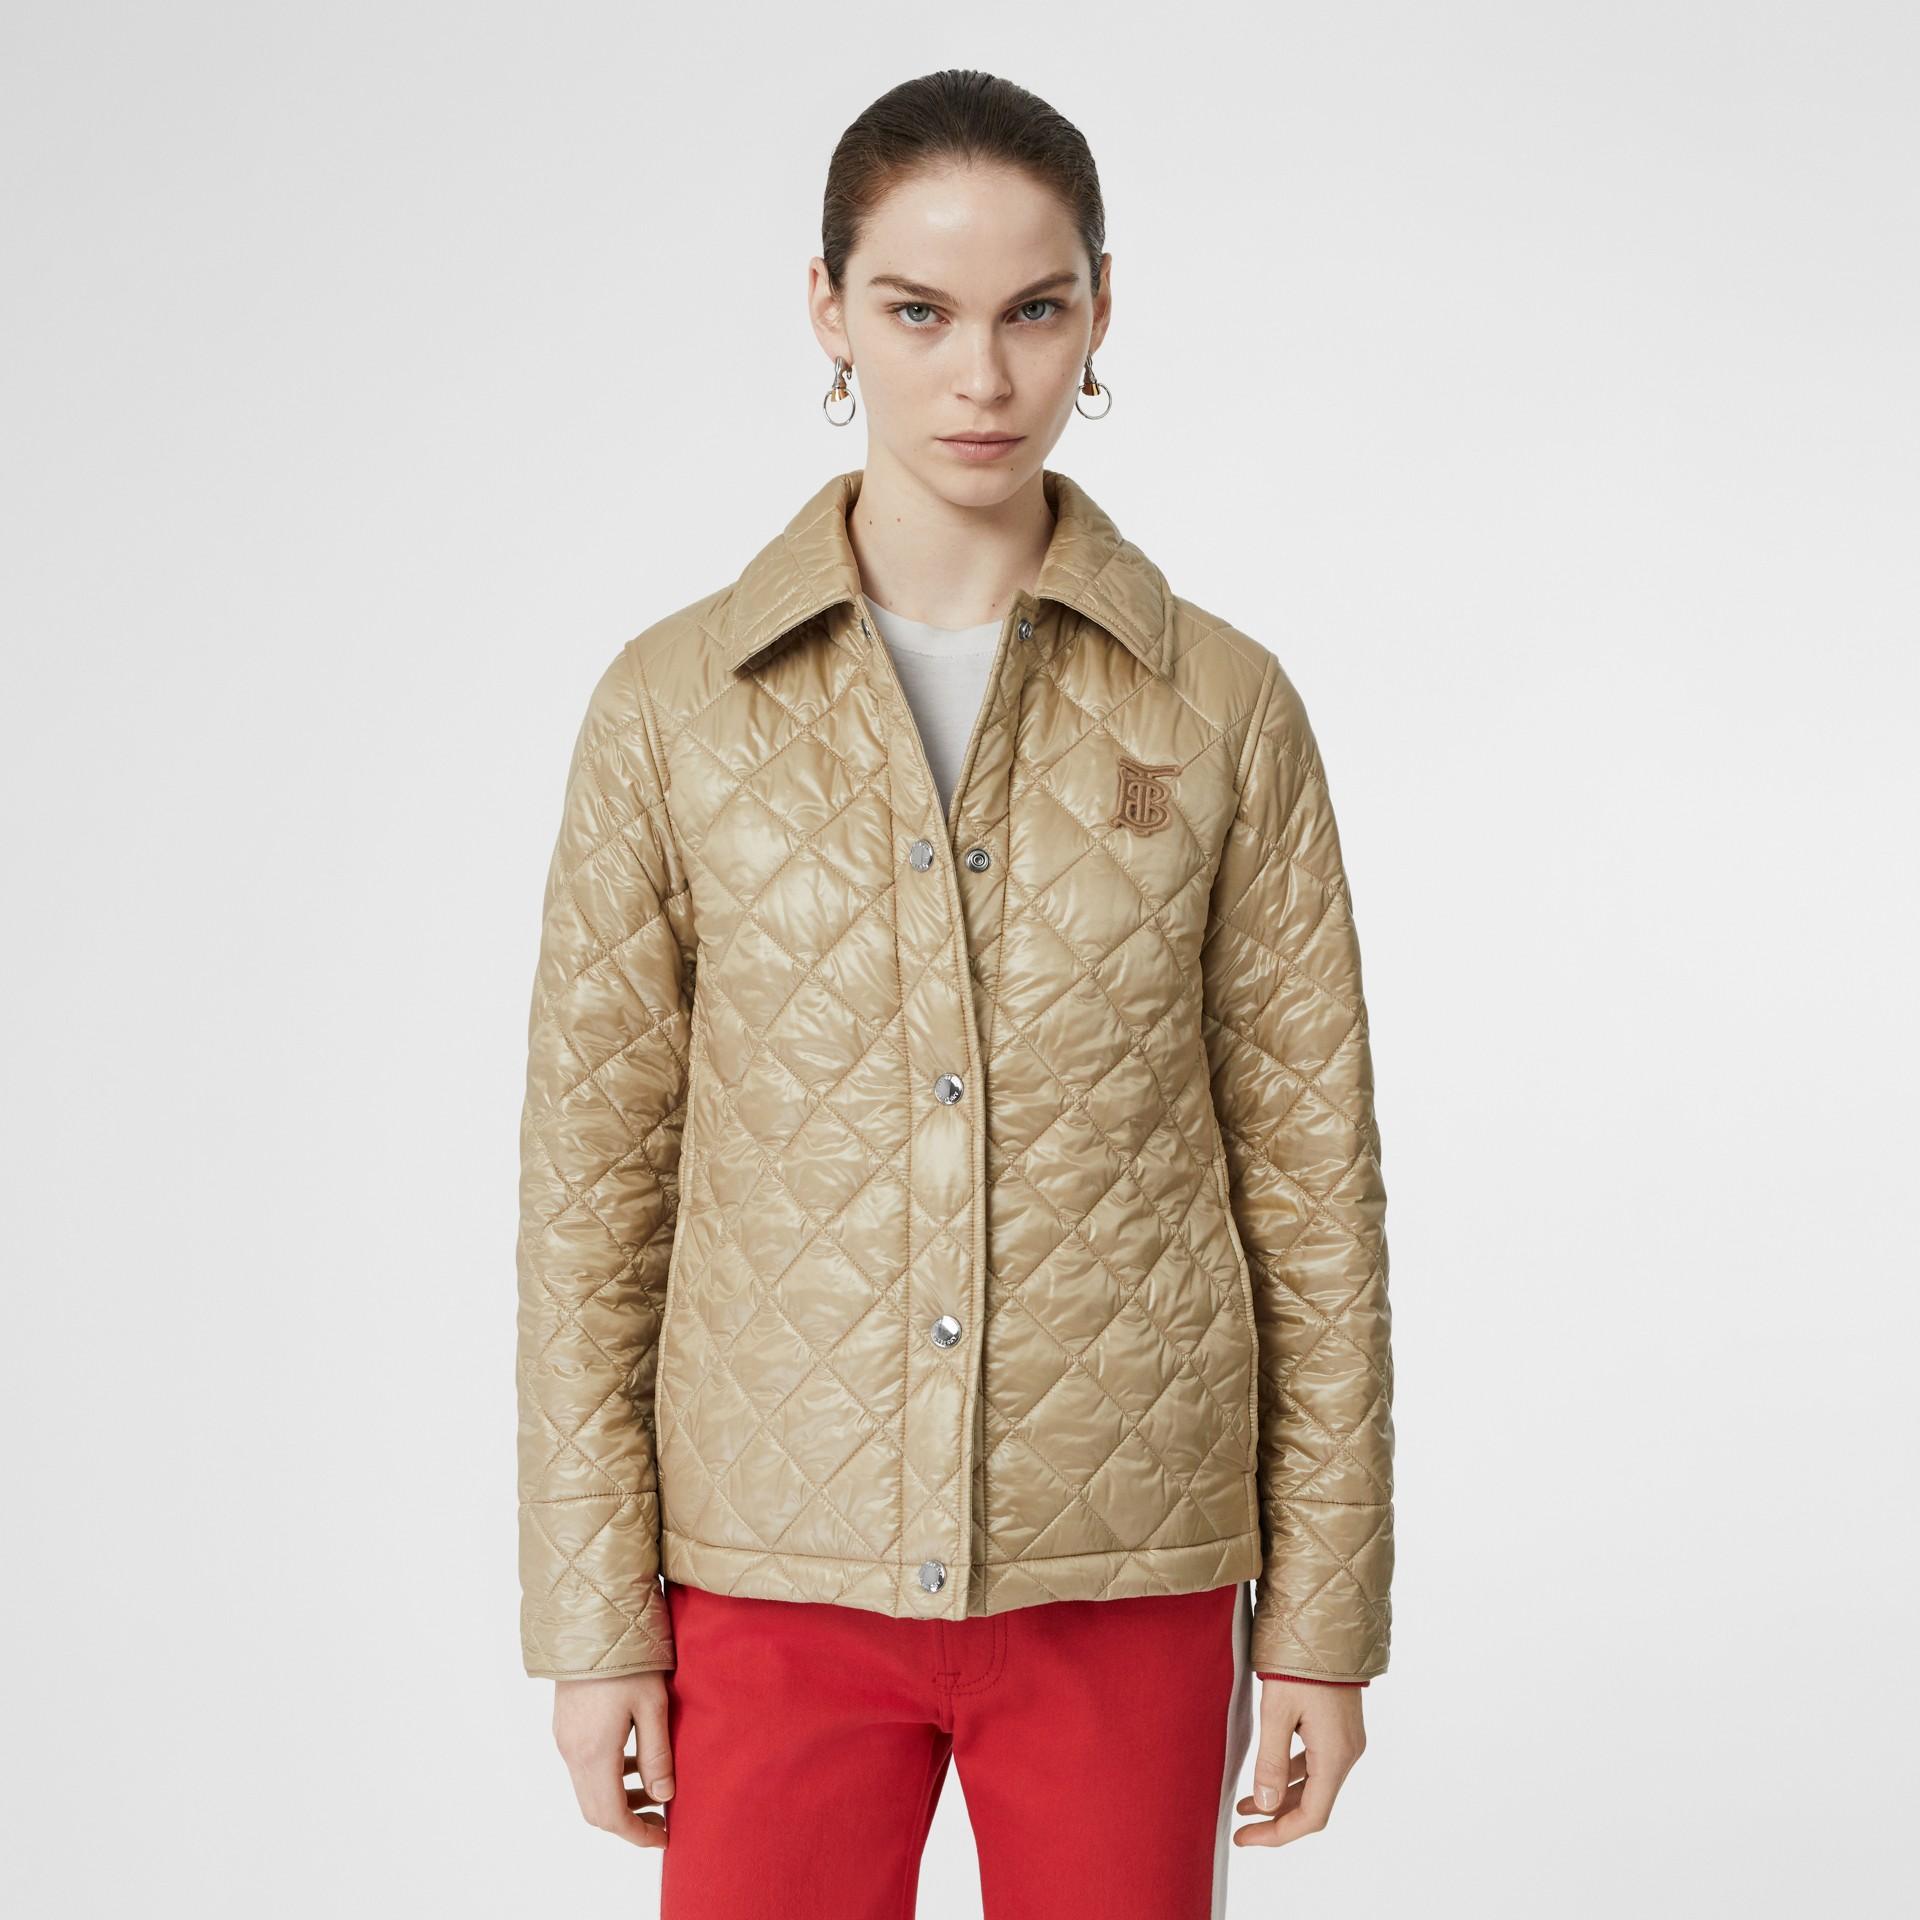 Monogram Motif Diamond Quilted Jacket in Honey - Women | Burberry Hong Kong - gallery image 5